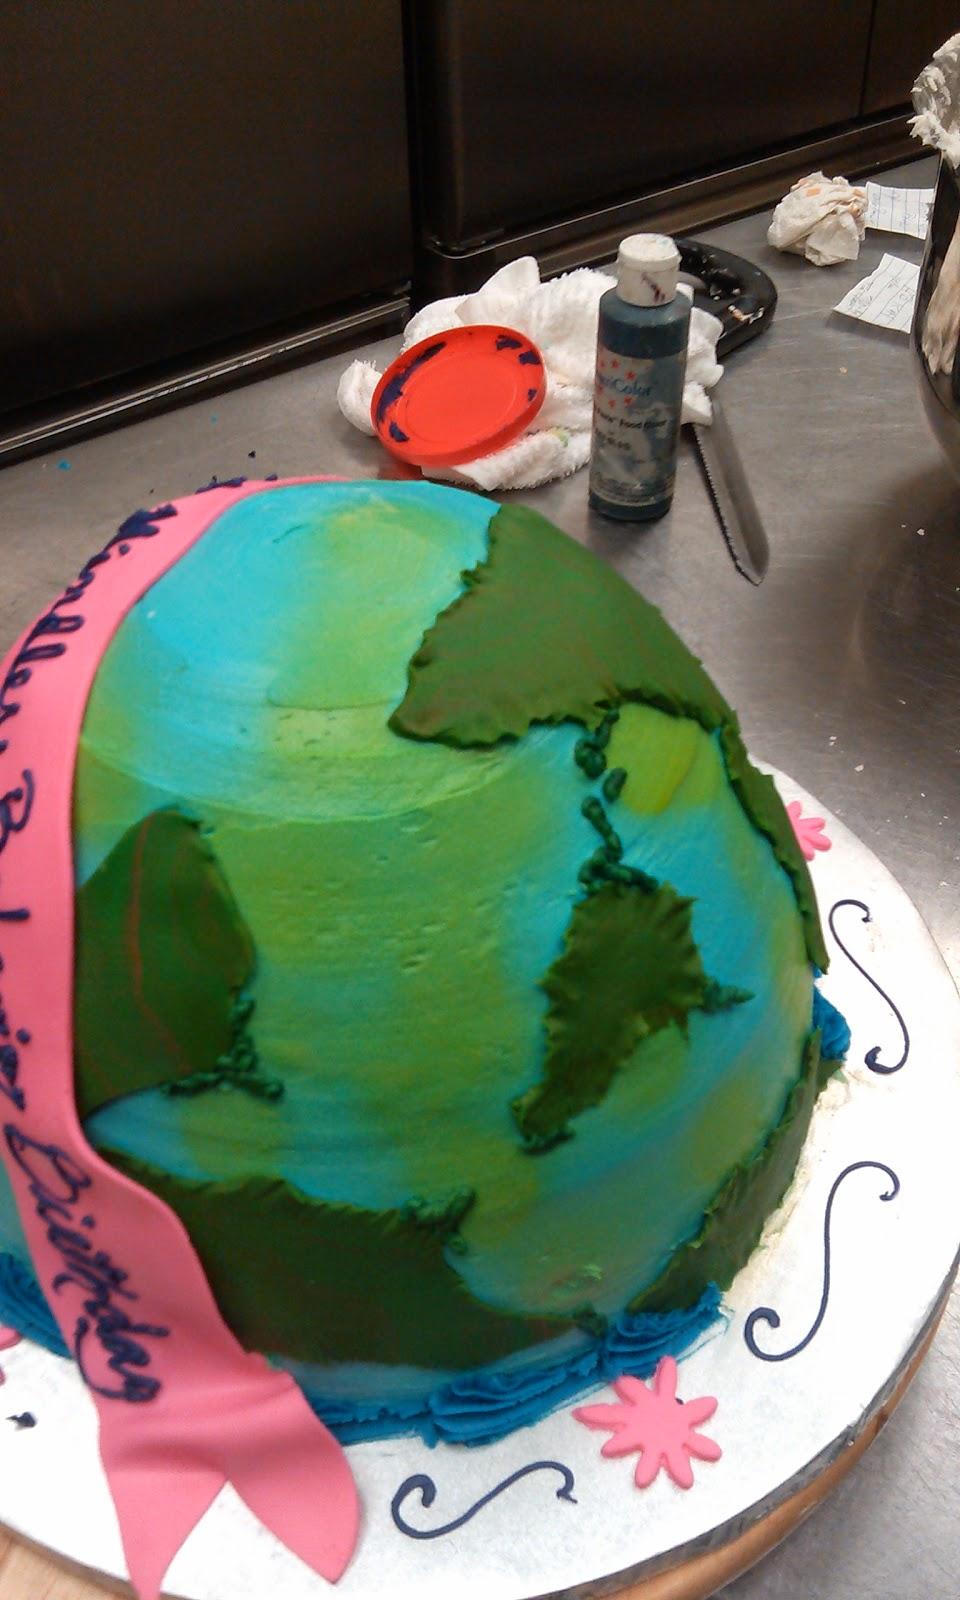 Cake Art Lawrenceville Hwy : CAFE AROMAS: Mindless Behavior World Tour Globe Cake